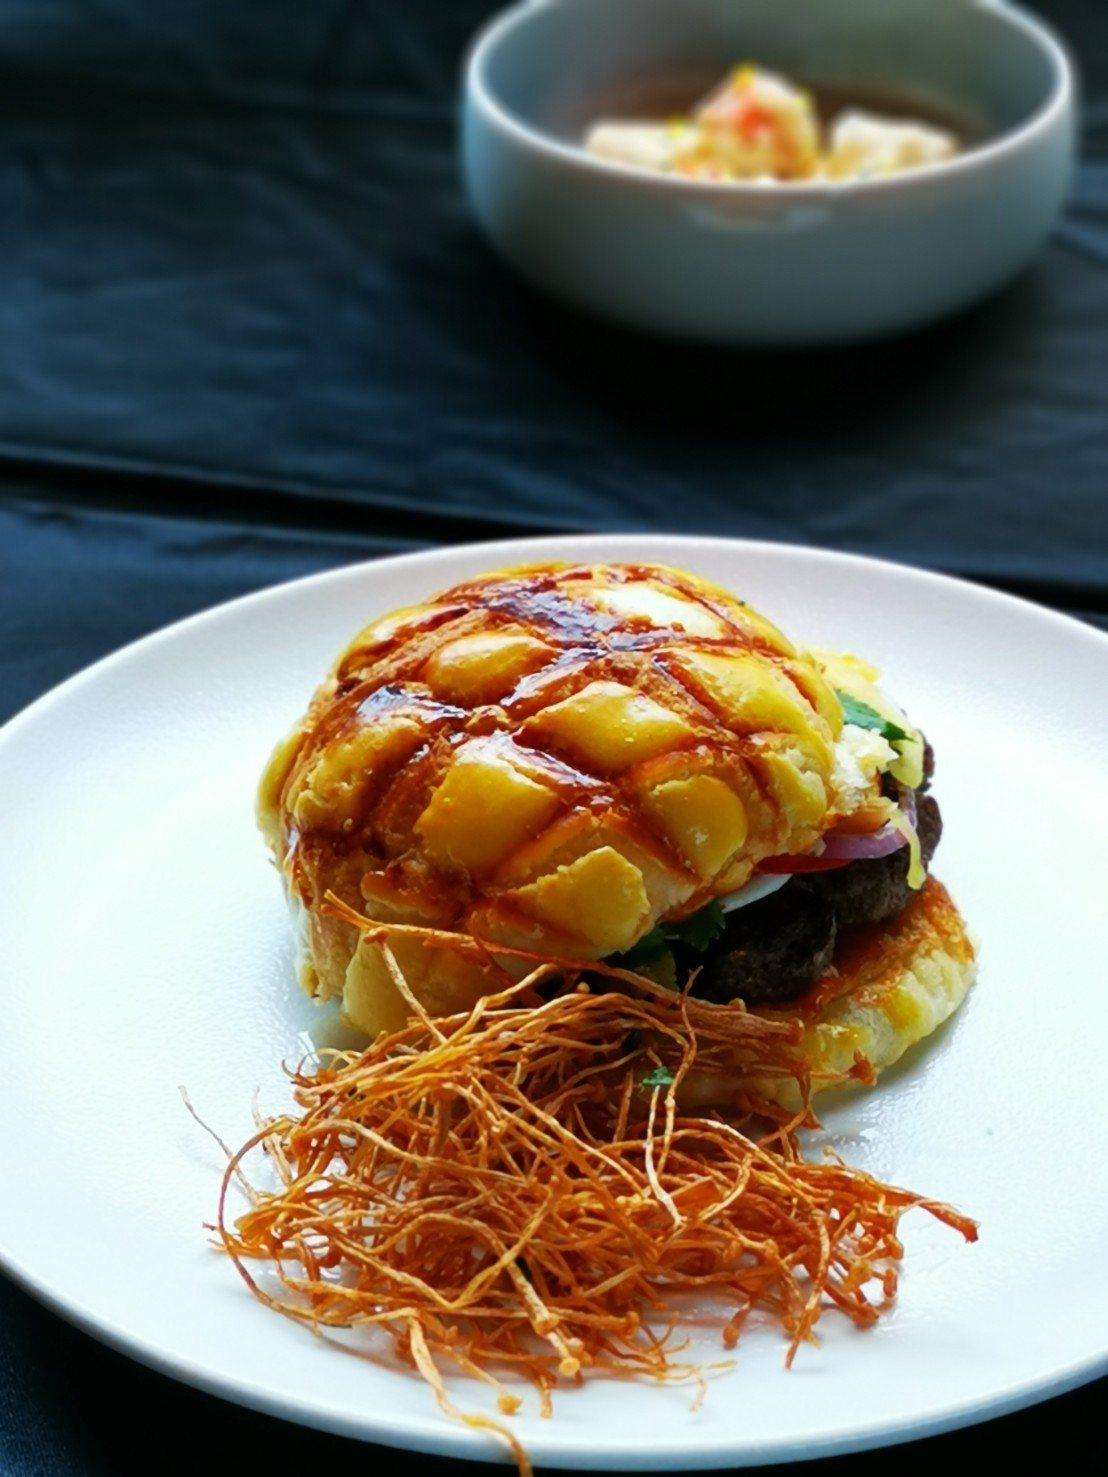 CHAR 2.0 新菜單-炭烤夏威夷風花生牛肉漢堡。記者韓化宇/攝影